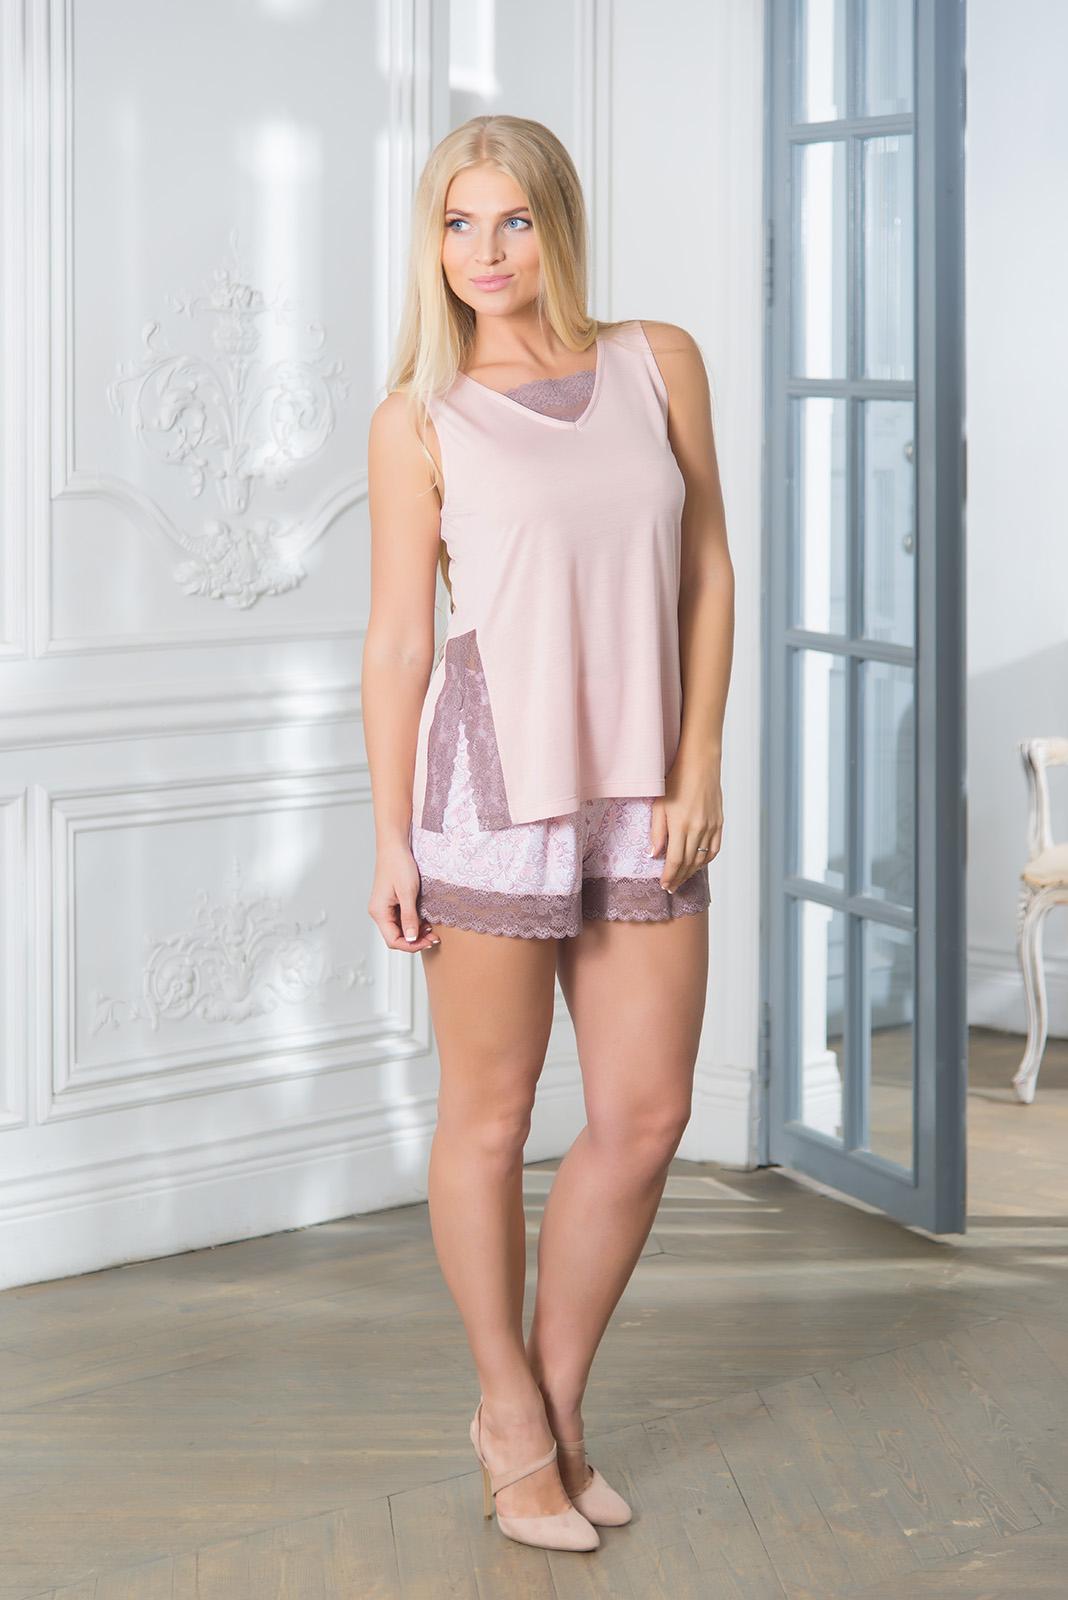 Пижамы Mia Cara Пижама Paulina Цвет: Розовый (M-L) пижамы mia cara пижама paisley цвет розовый m l